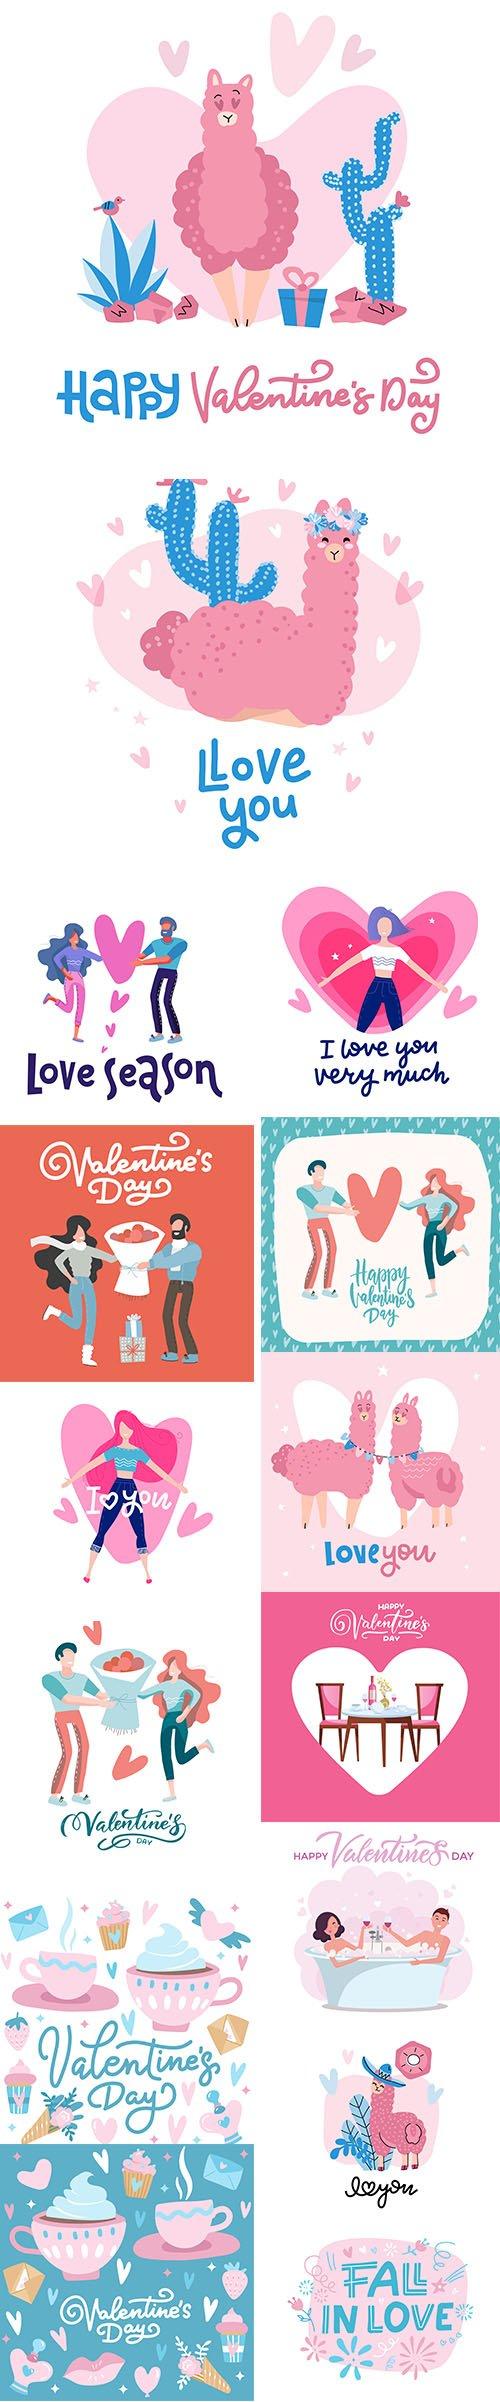 Set of Romantic Valentines Day Illustrations Vol 10